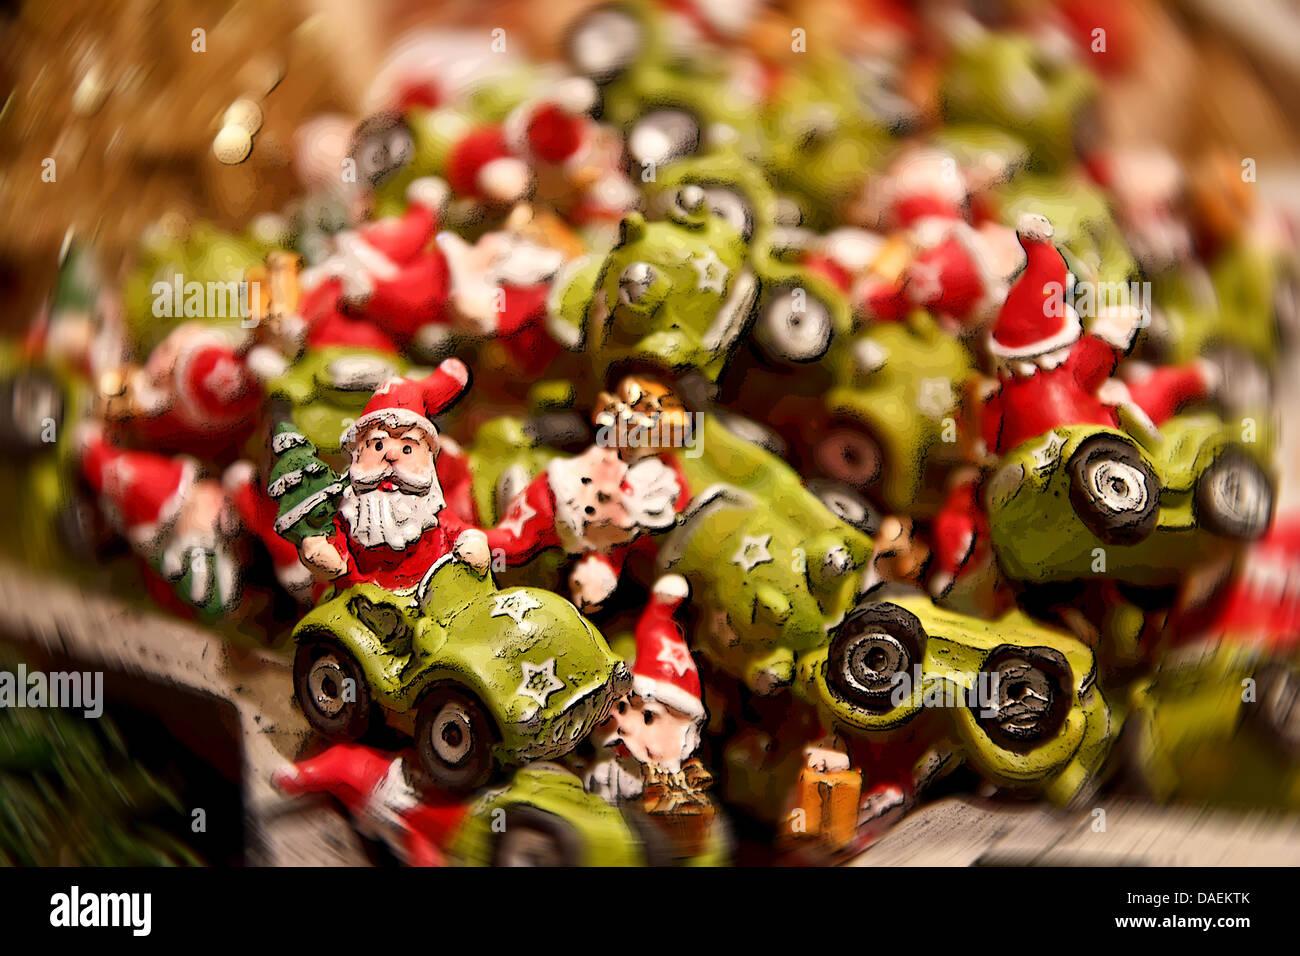 Pile of kitschy cheap Christmas ornaments depicting Santa Claus ...